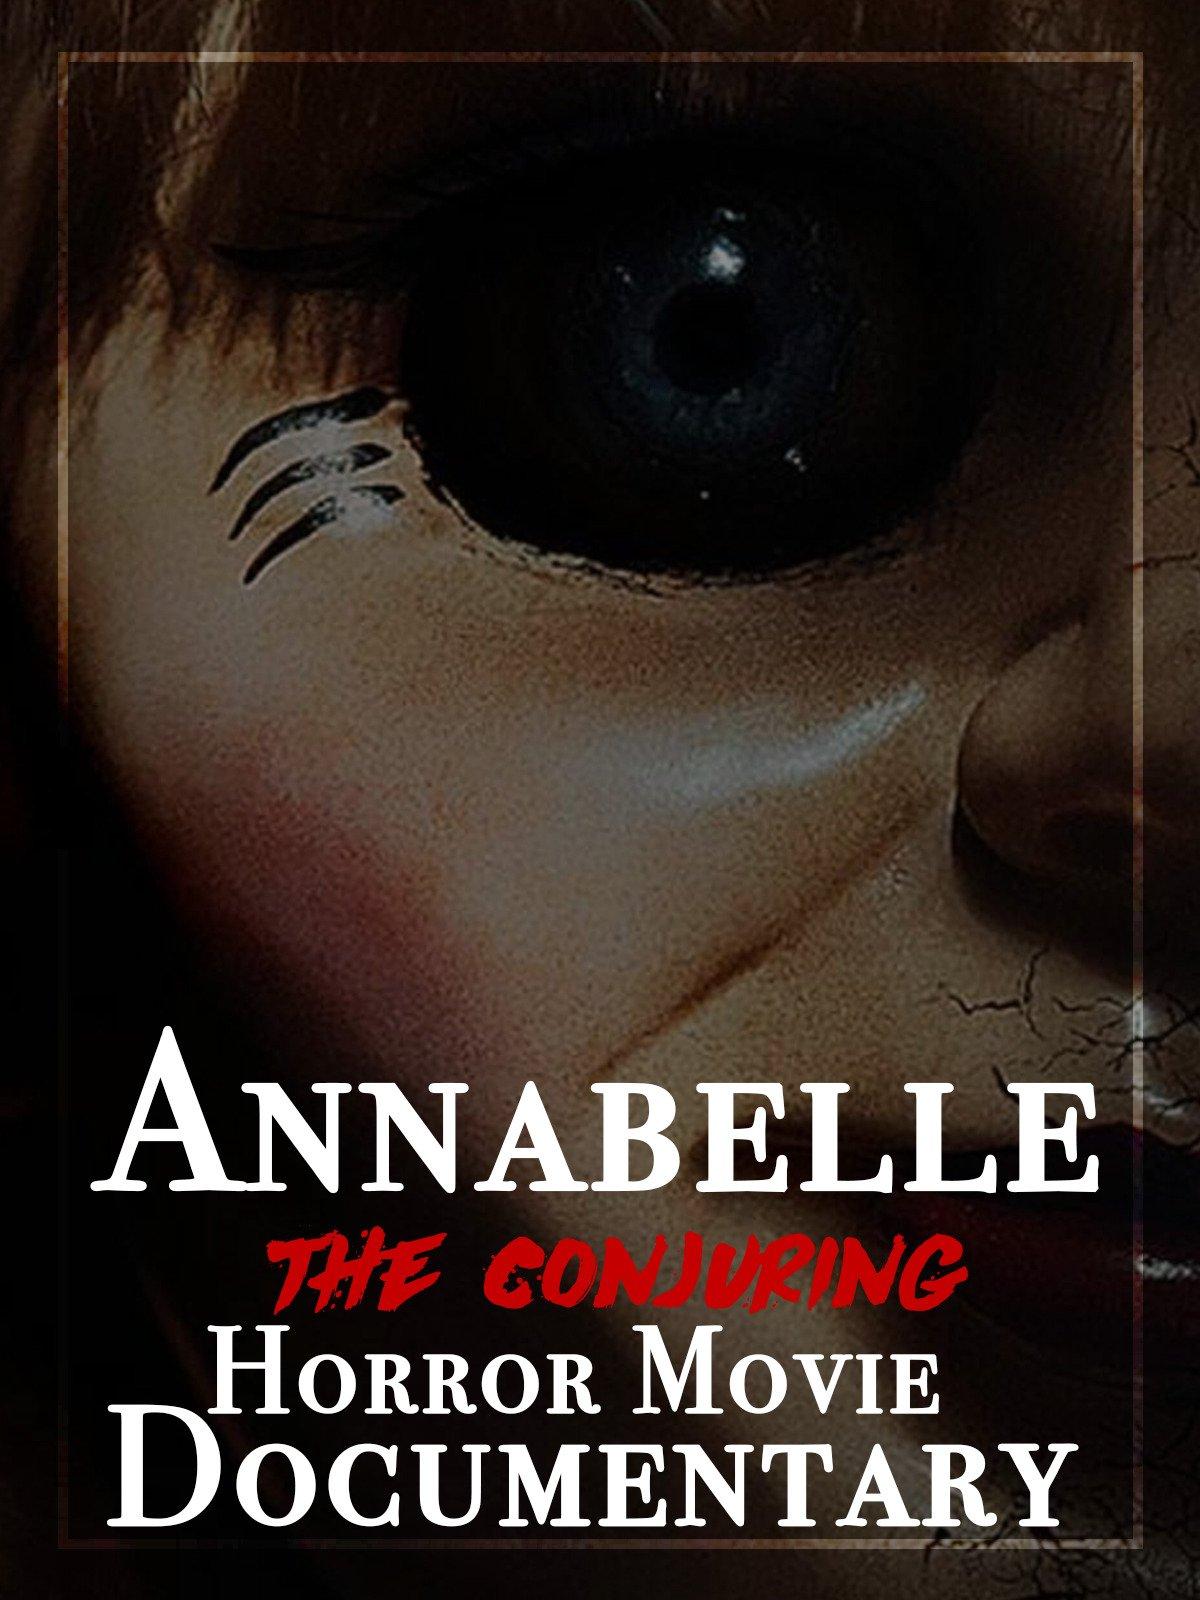 Amazon.com: Annabelle The Conjuring Horror Movie Documentary: Caro G ...